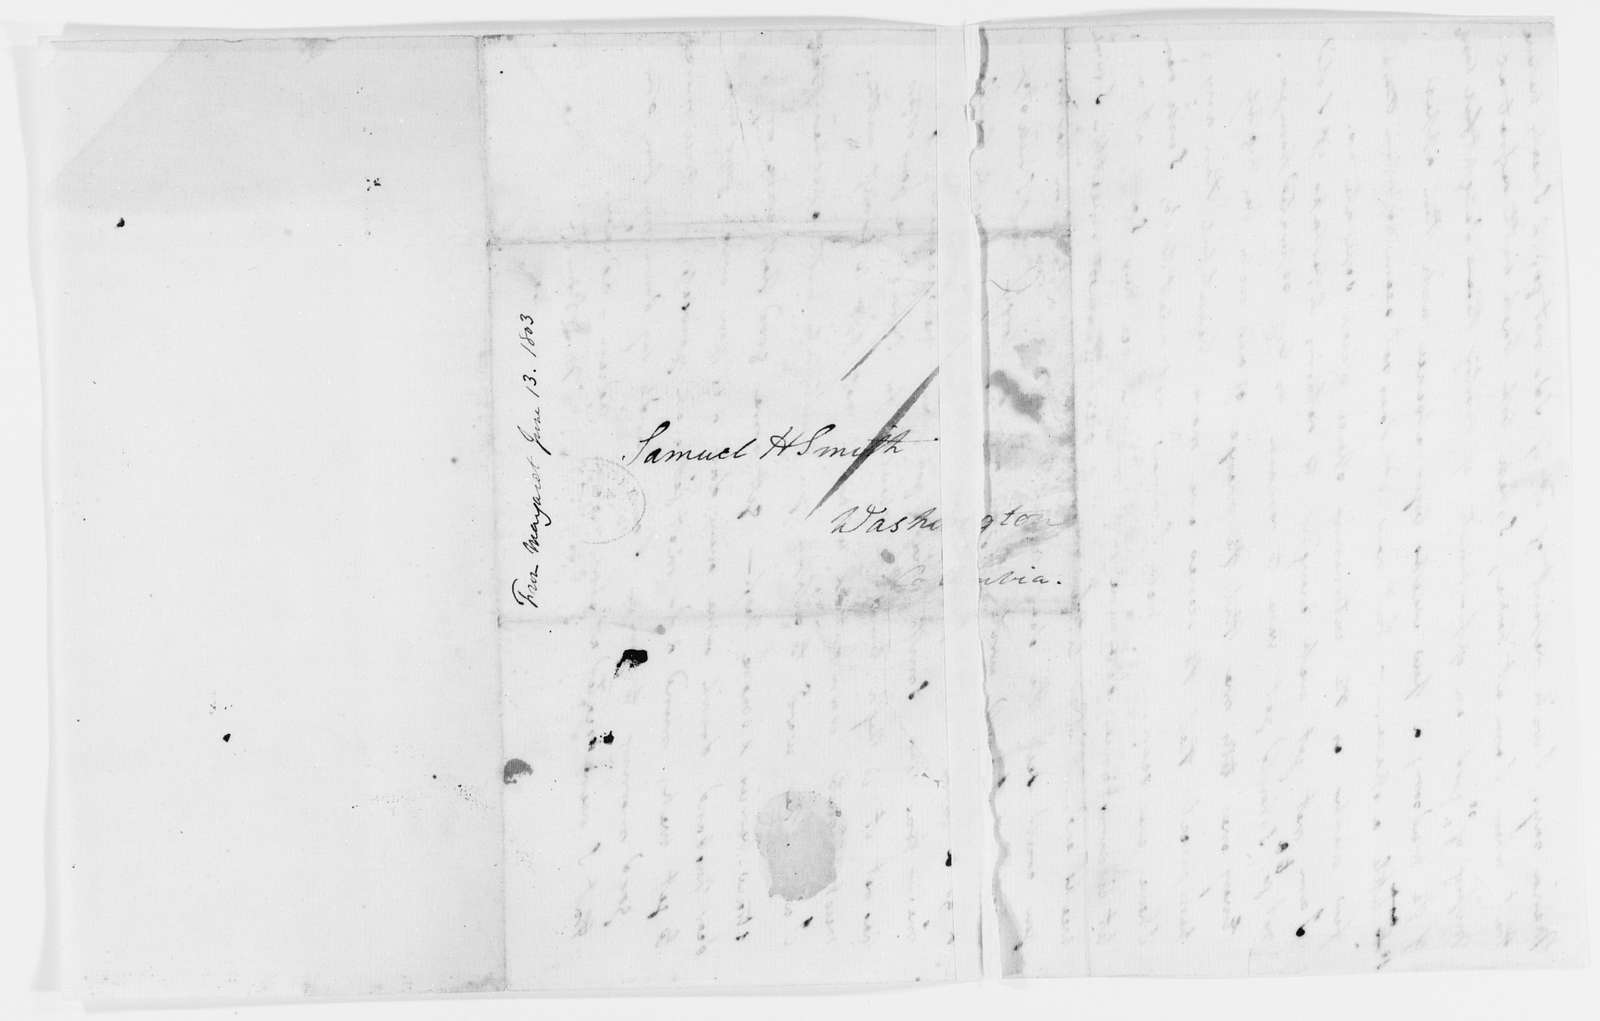 Margaret Bayard Smith Papers: Family Correspondence, 1789-1842; Smith, Samuel Harrison (husband); 1803, June-Sept